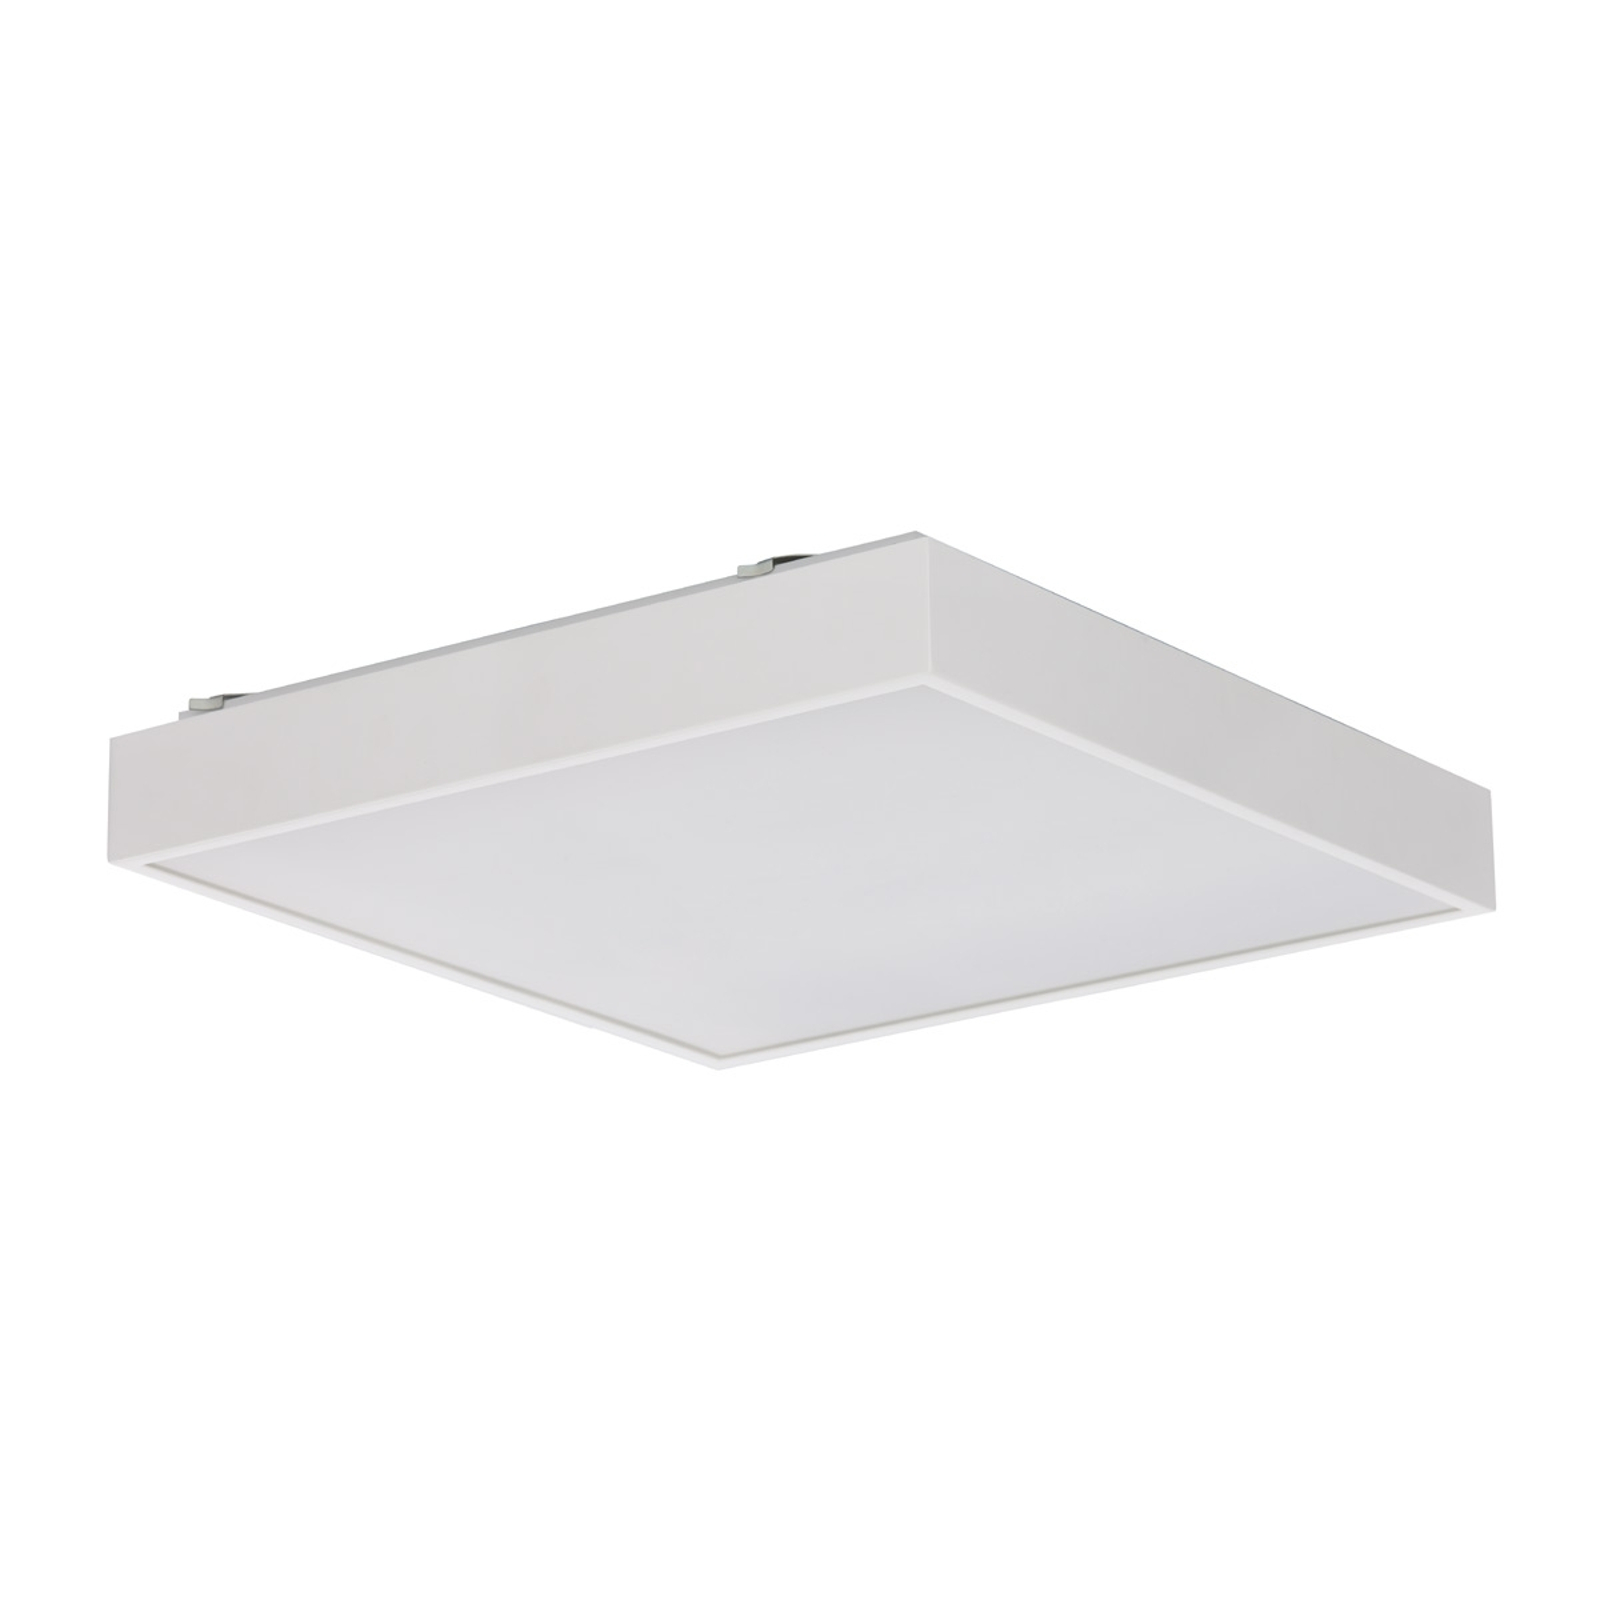 Led-plafondlamp Q5, wit, DALI